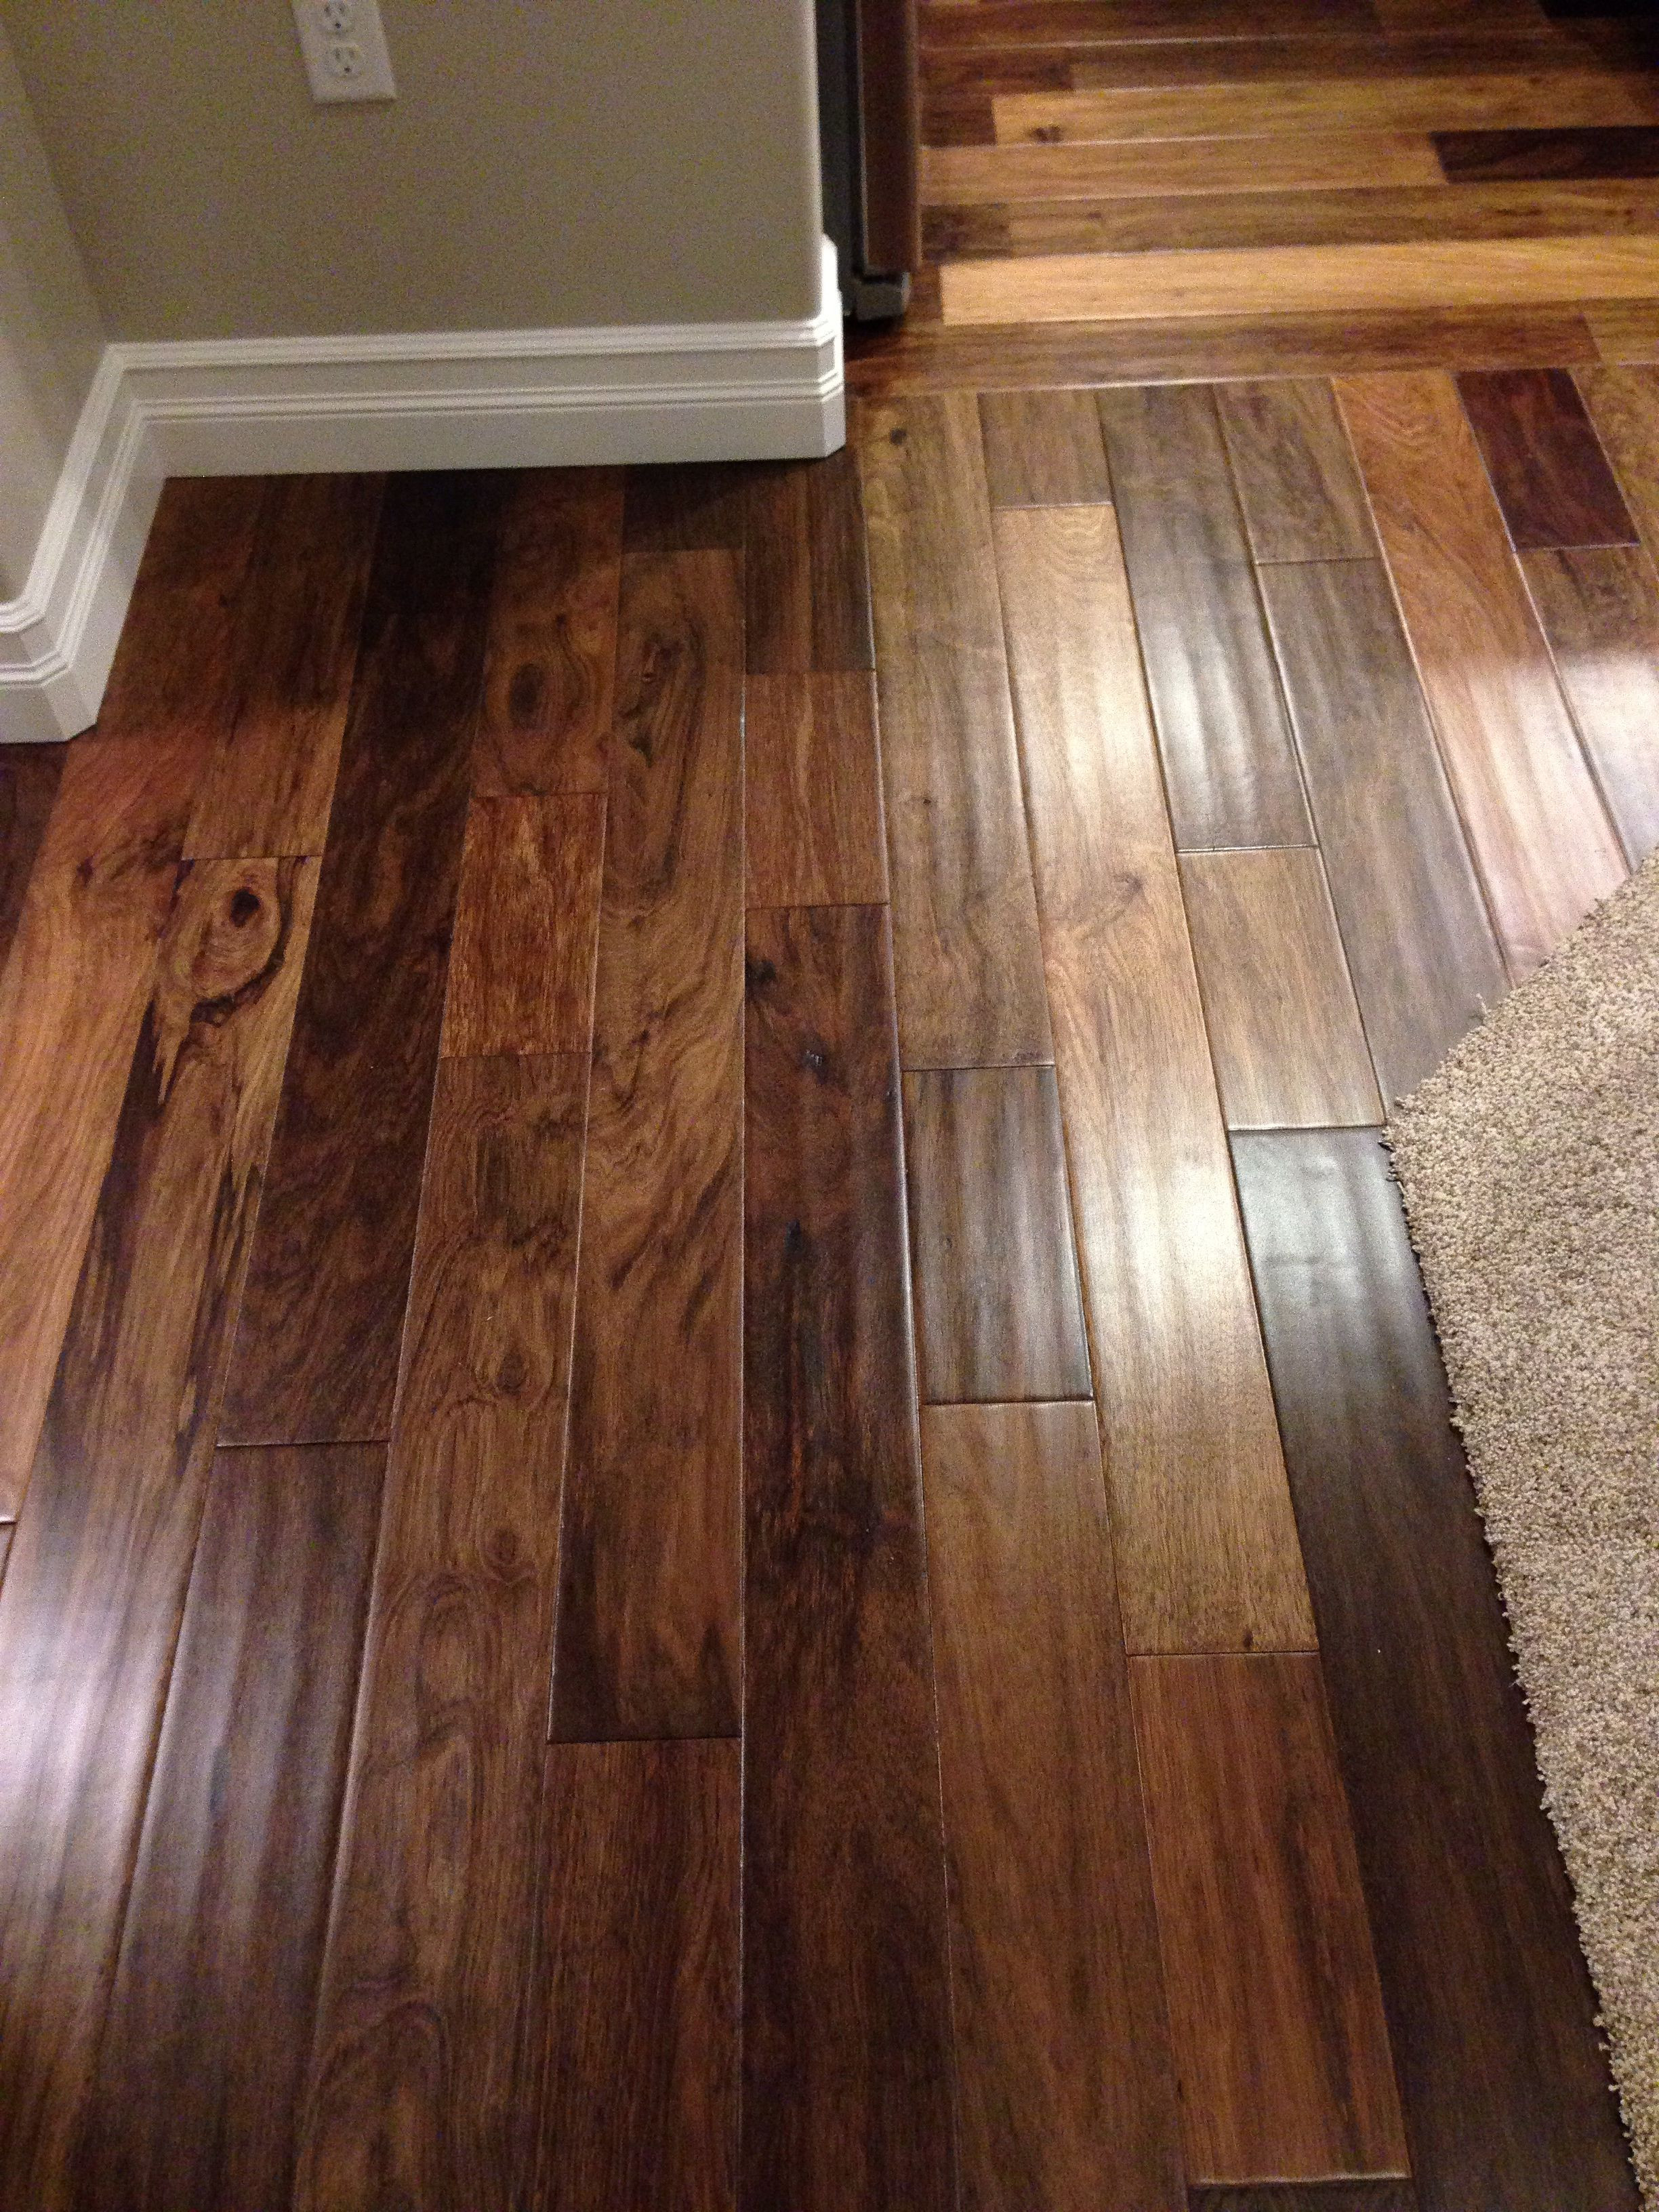 acacia hardwood flooring prices of african ebony engineered wood floor by mohawk 5 inch plank hand intended for african ebony engineered wood floor by mohawk 5 inch plank hand scraped would